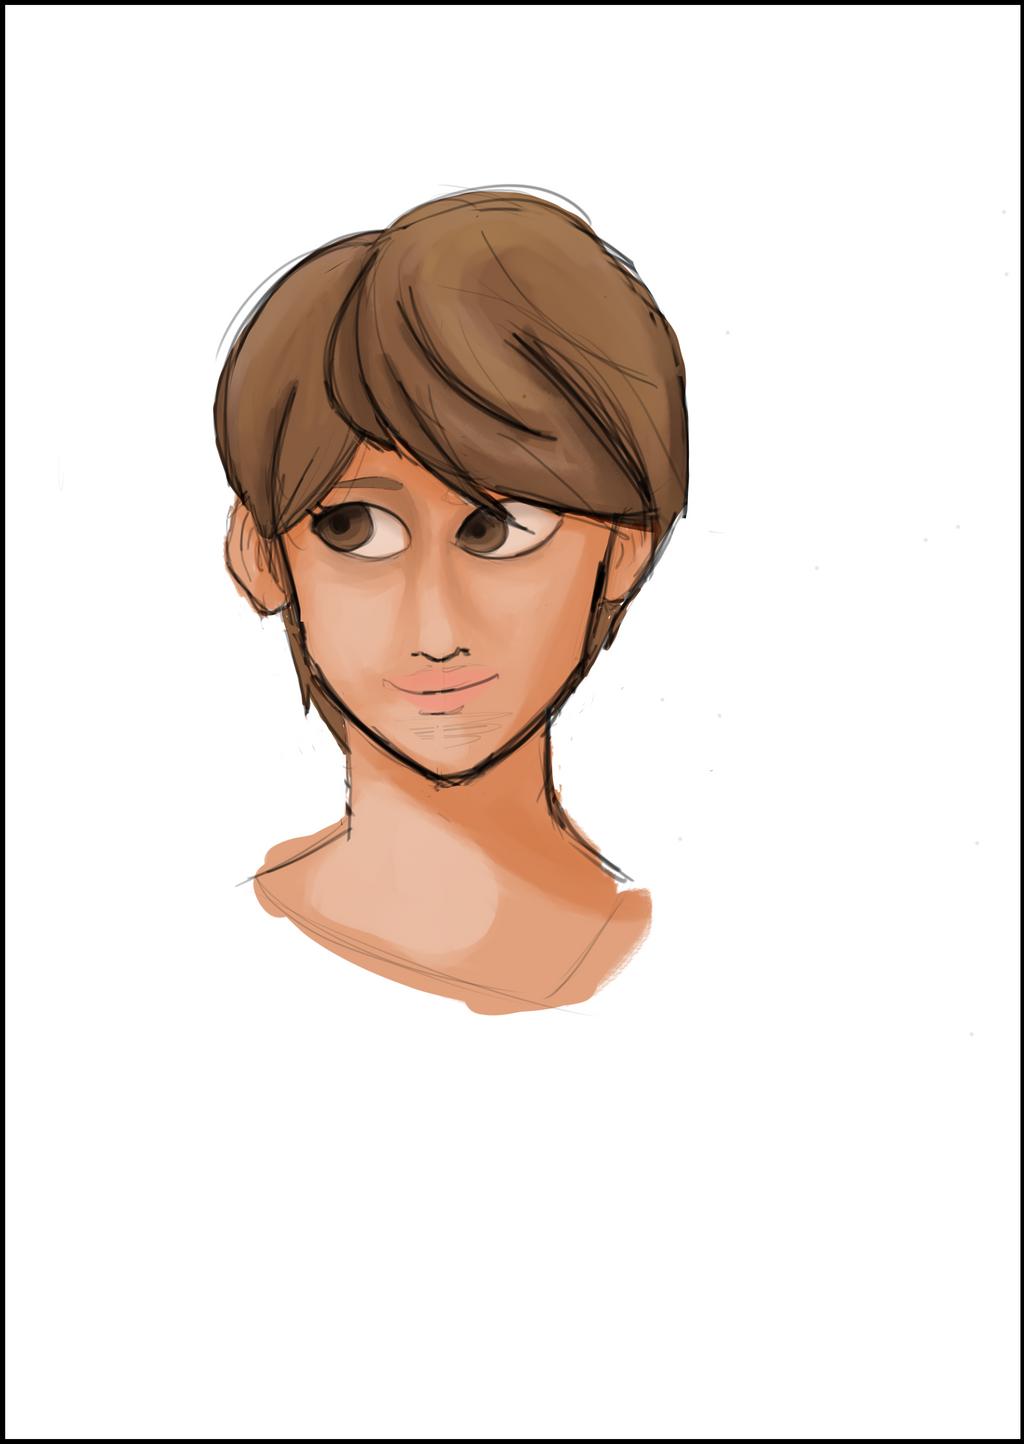 Brown eyed girl by jgsheffe